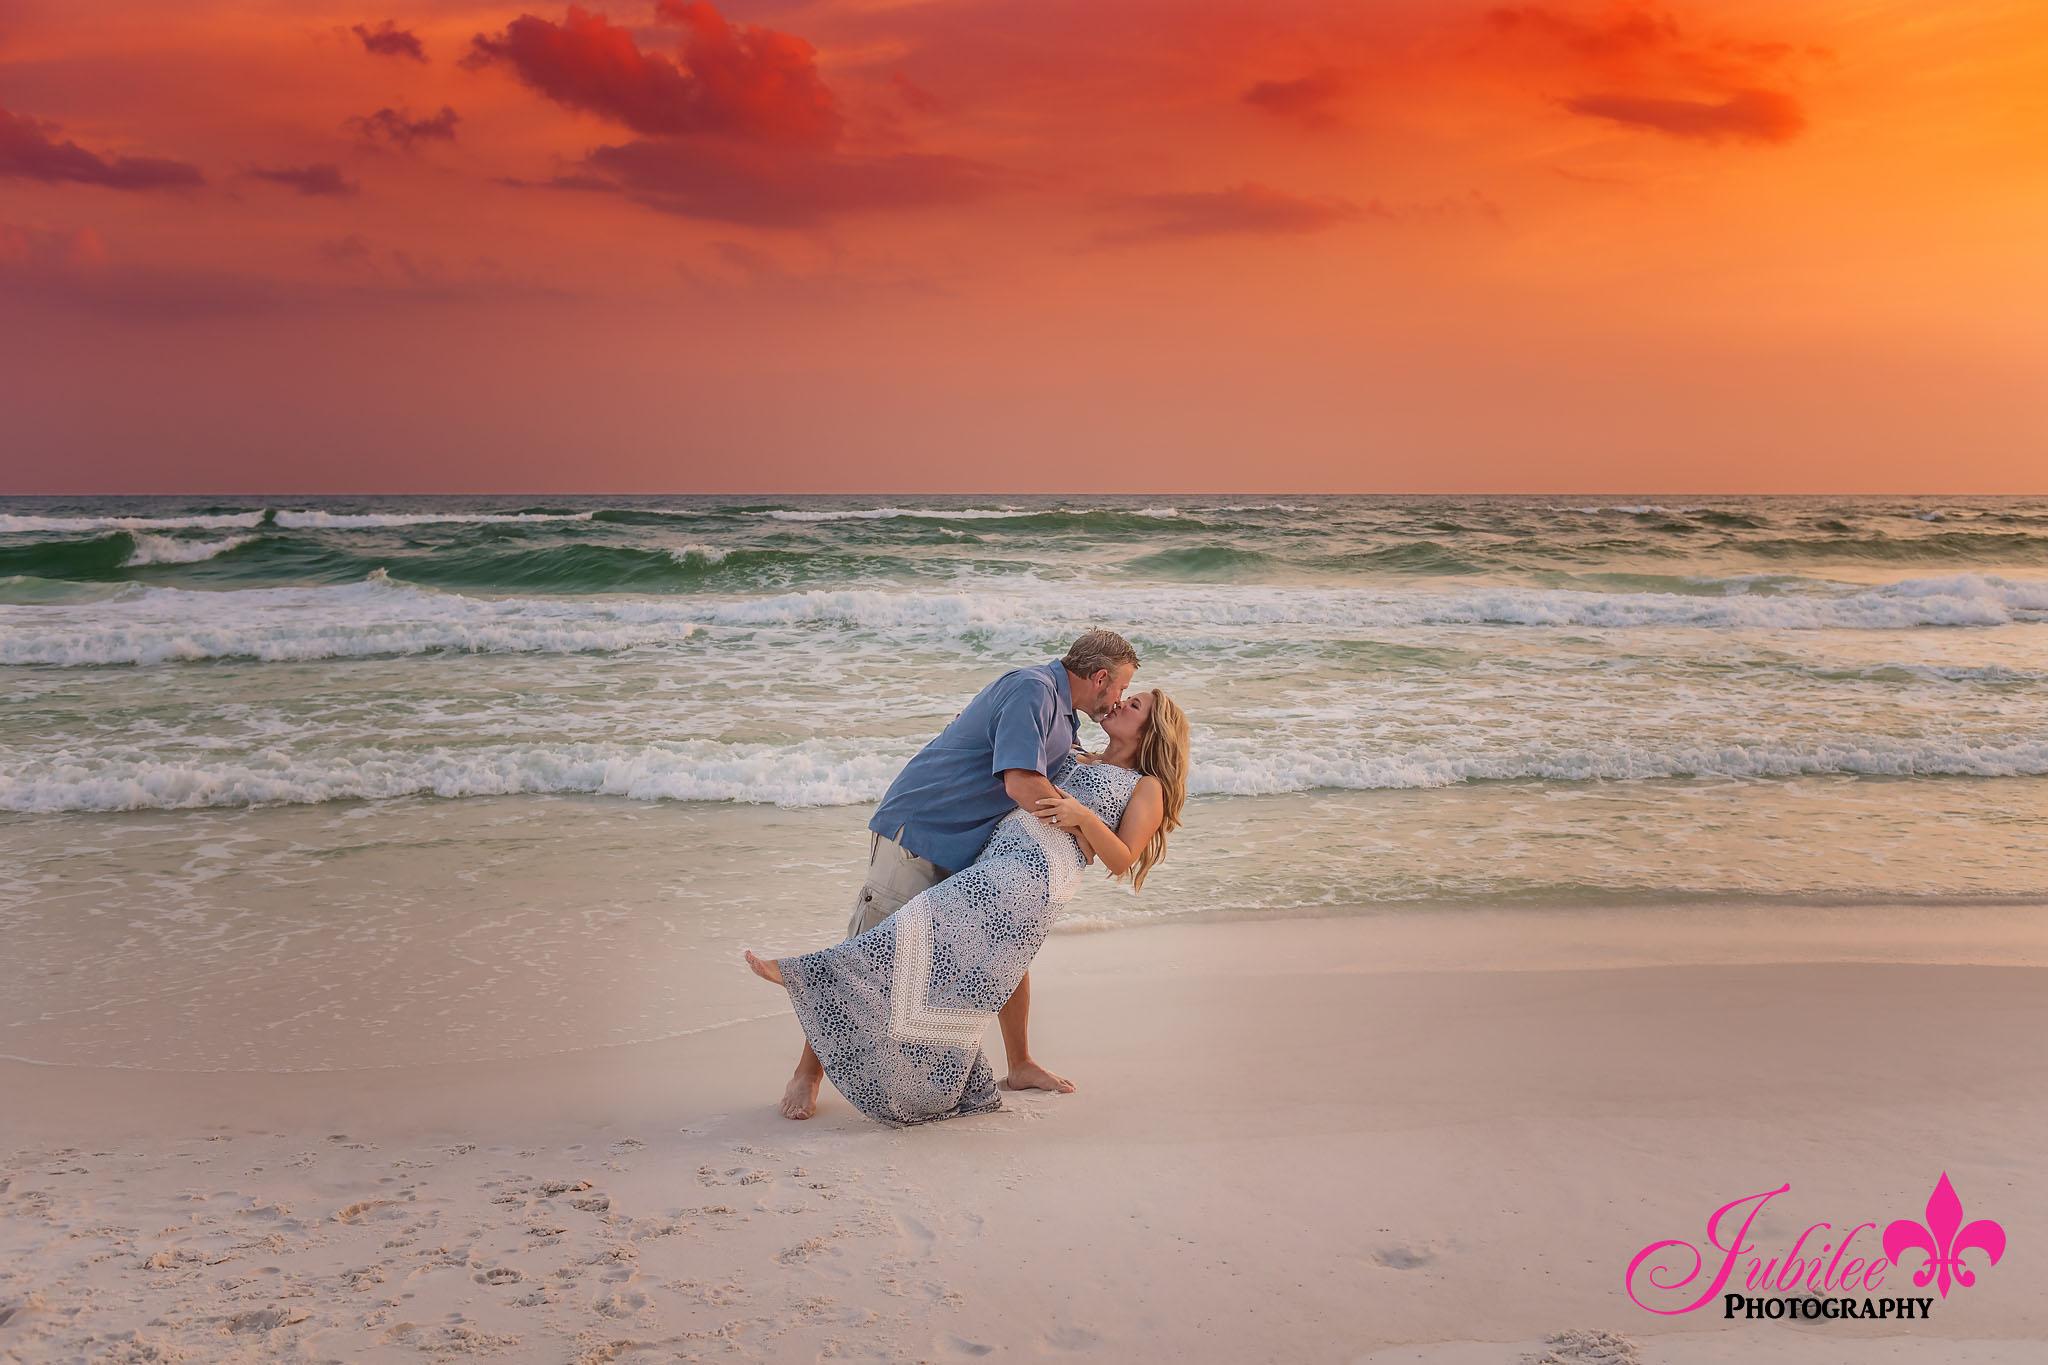 destin_beach_photographer_6204